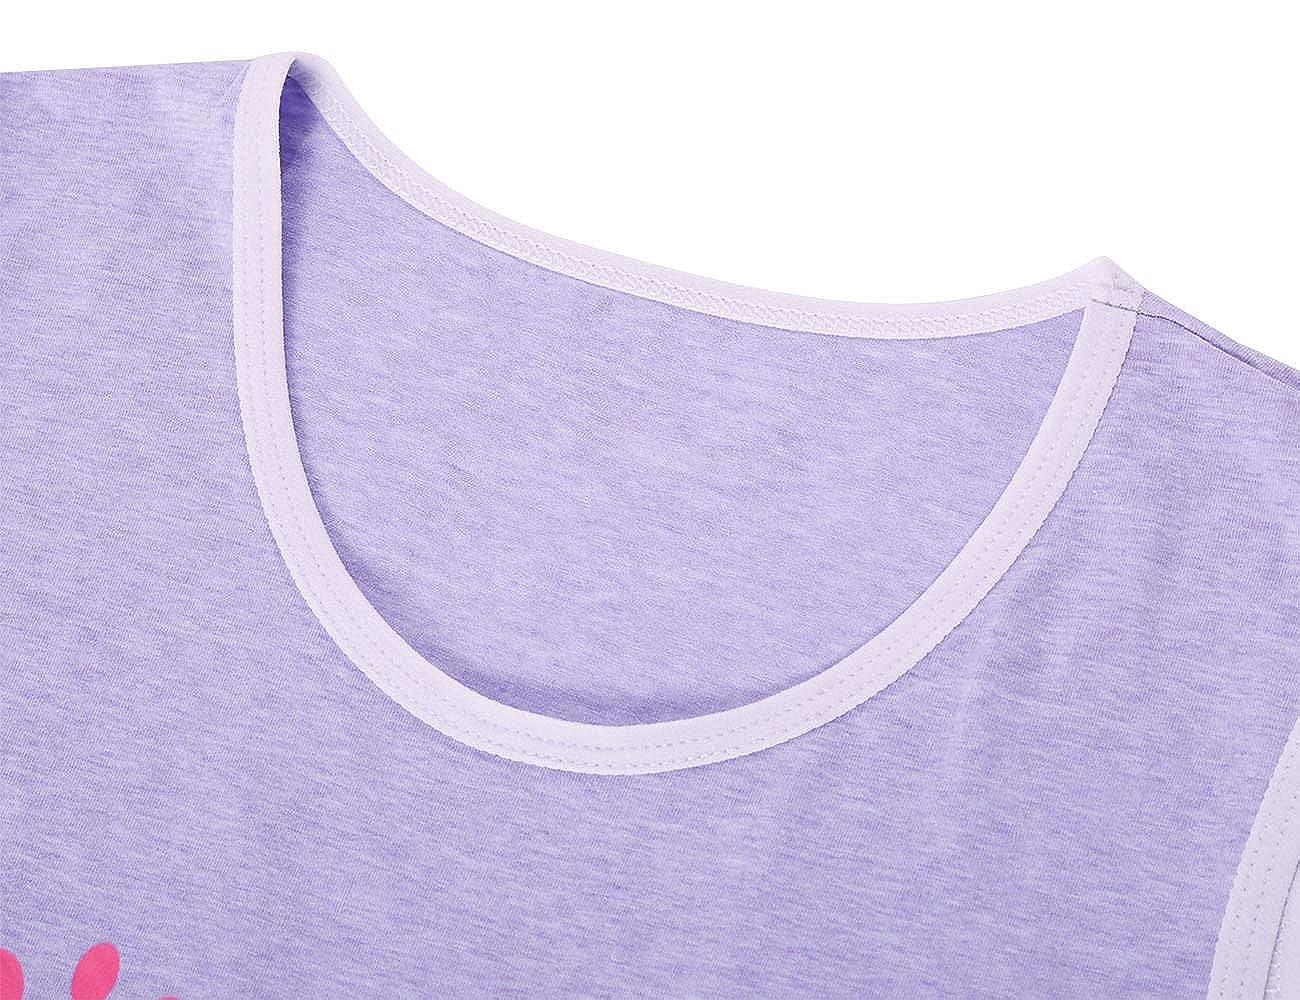 Jashe Big Girls 95 % Cotton Blue    Pink Nightgowns 2Pack Super Soft Cute  Kids Pajama ... a559bf93e